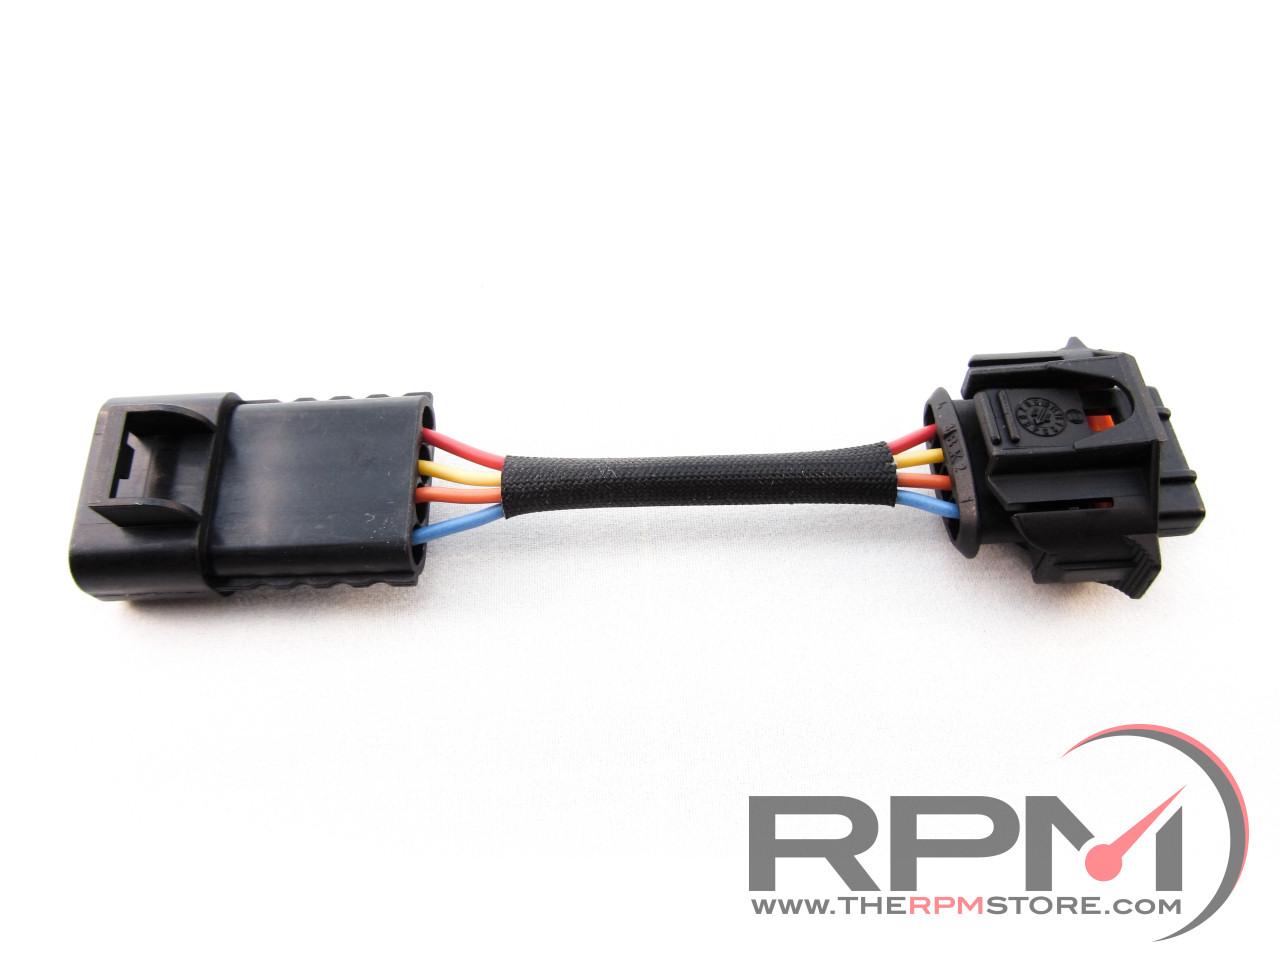 Bosch Map Sensor Plug  U0026 39 N U0026 39  Play Adapter Harness   Therpmstore Com